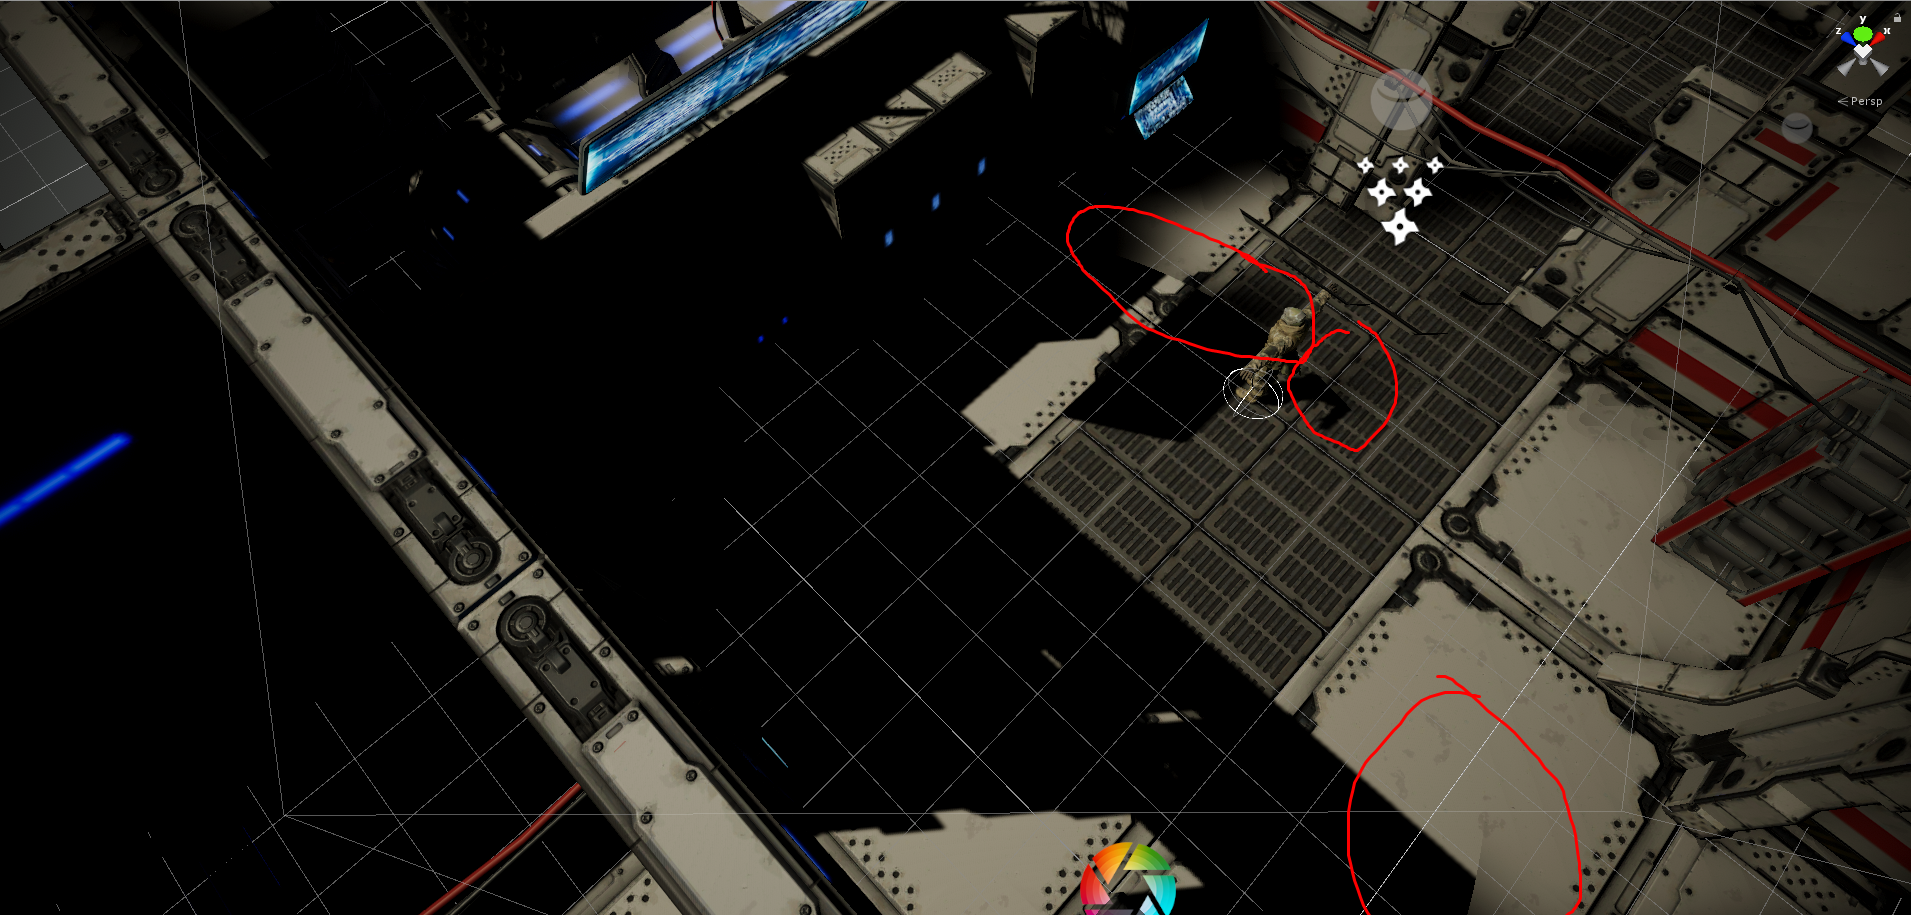 HDRP Shadow Distance, Camera Near/Far Clip Plane cuts